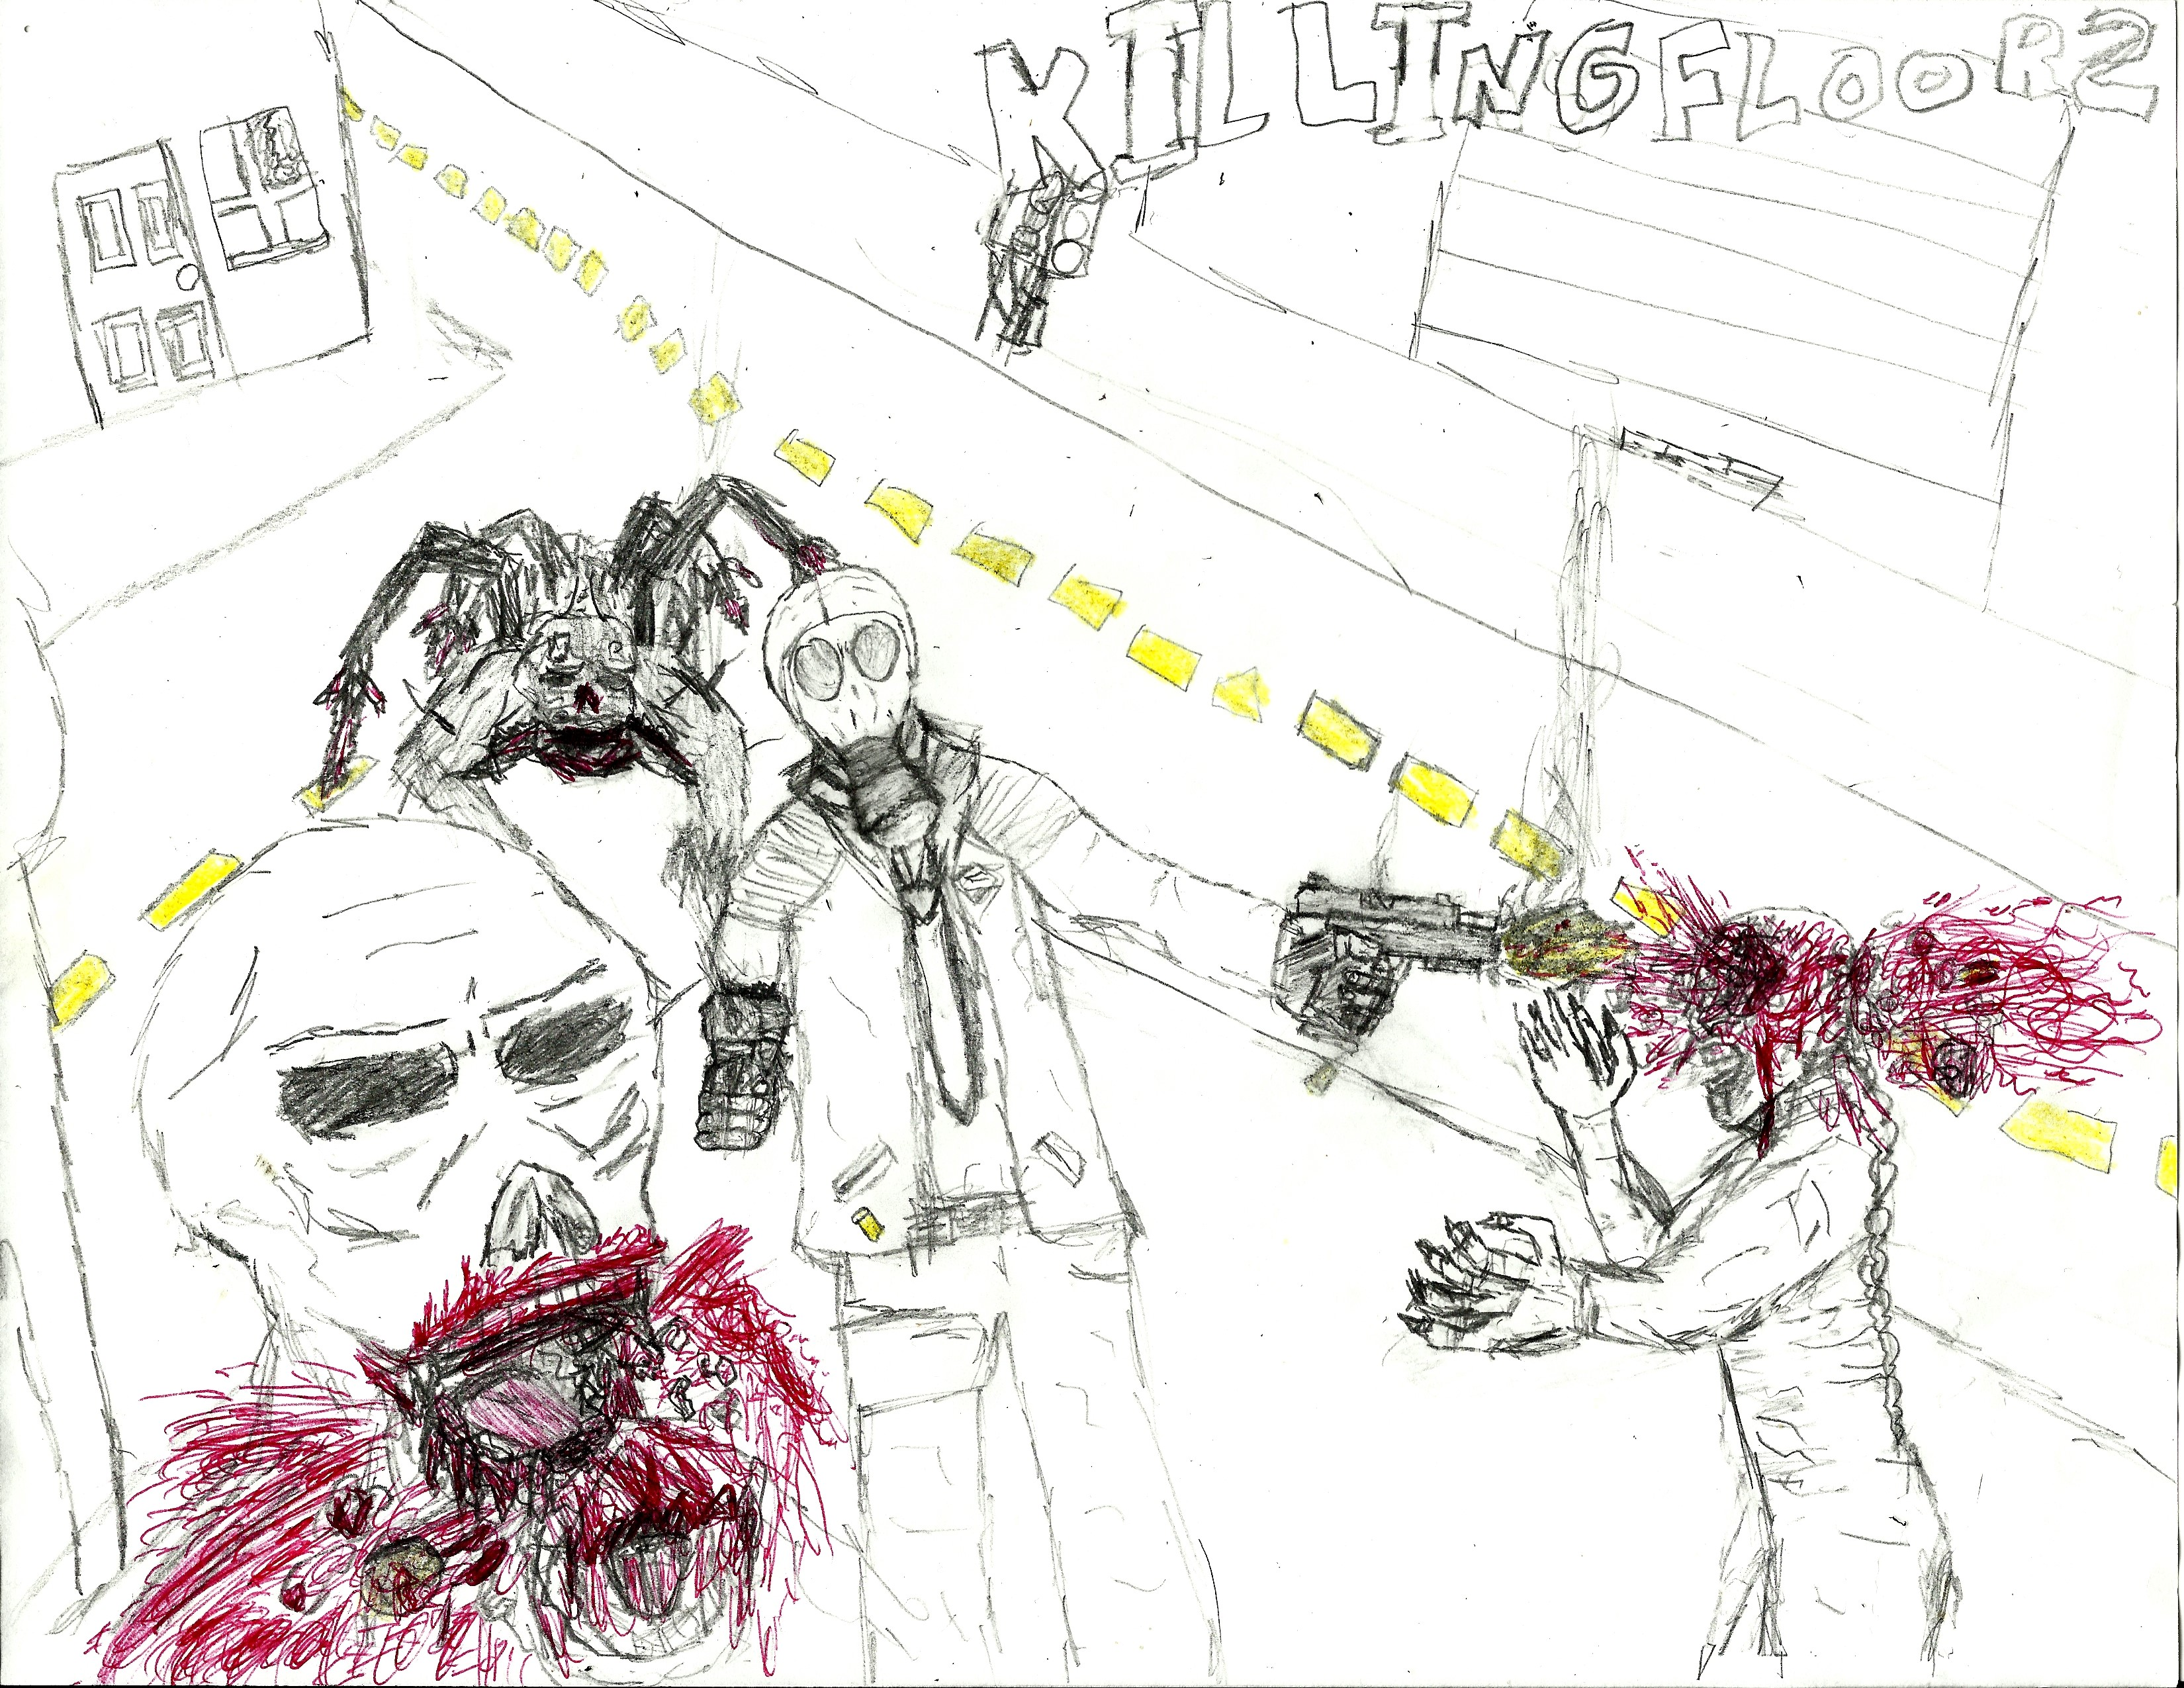 Killing Floor 2 hype finished